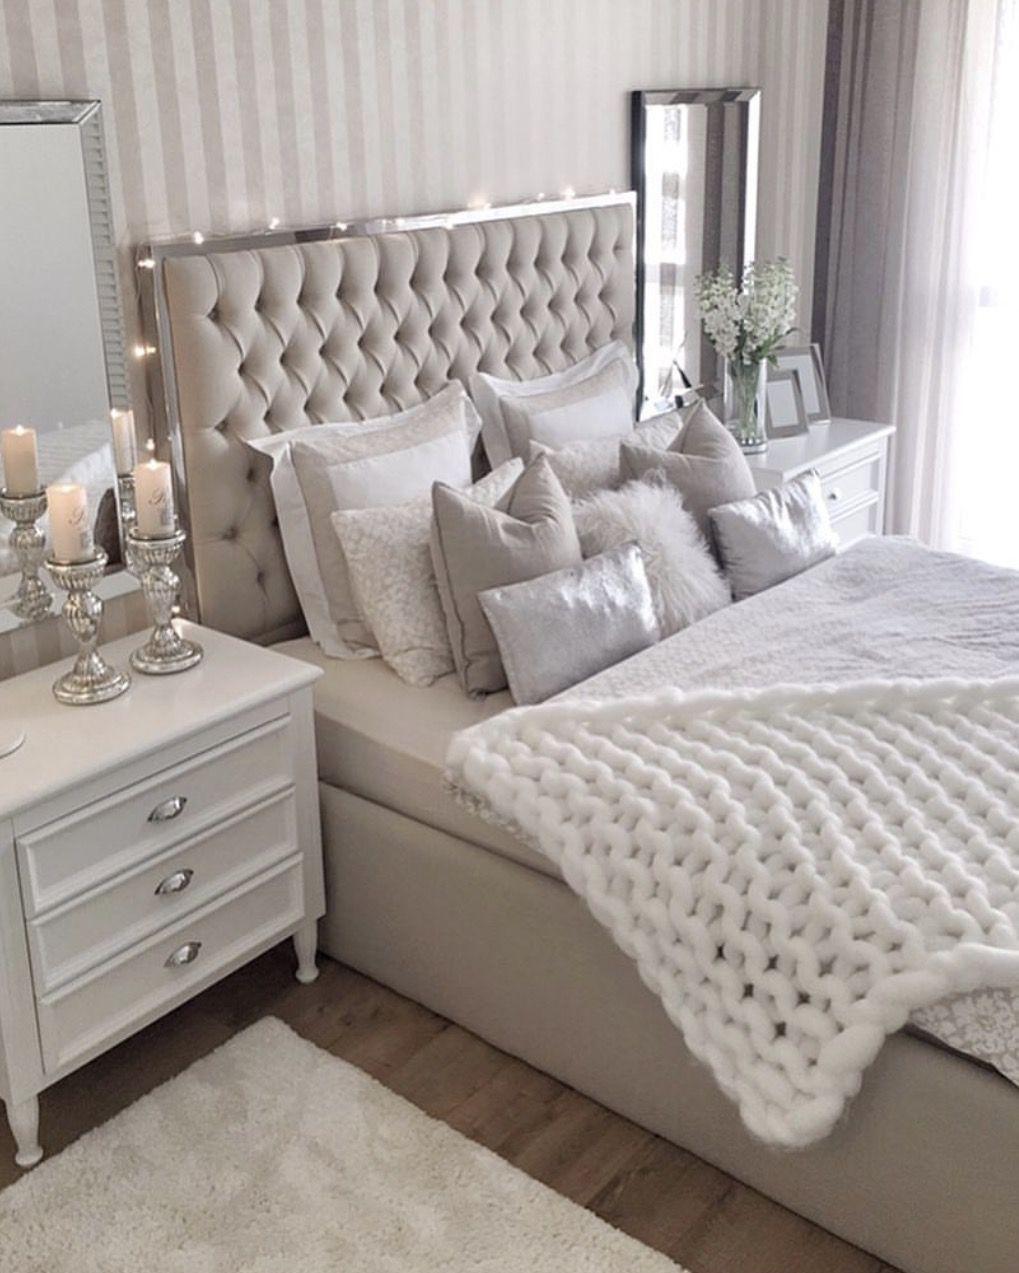 Inspiración dormitorio principal con papel de rayas